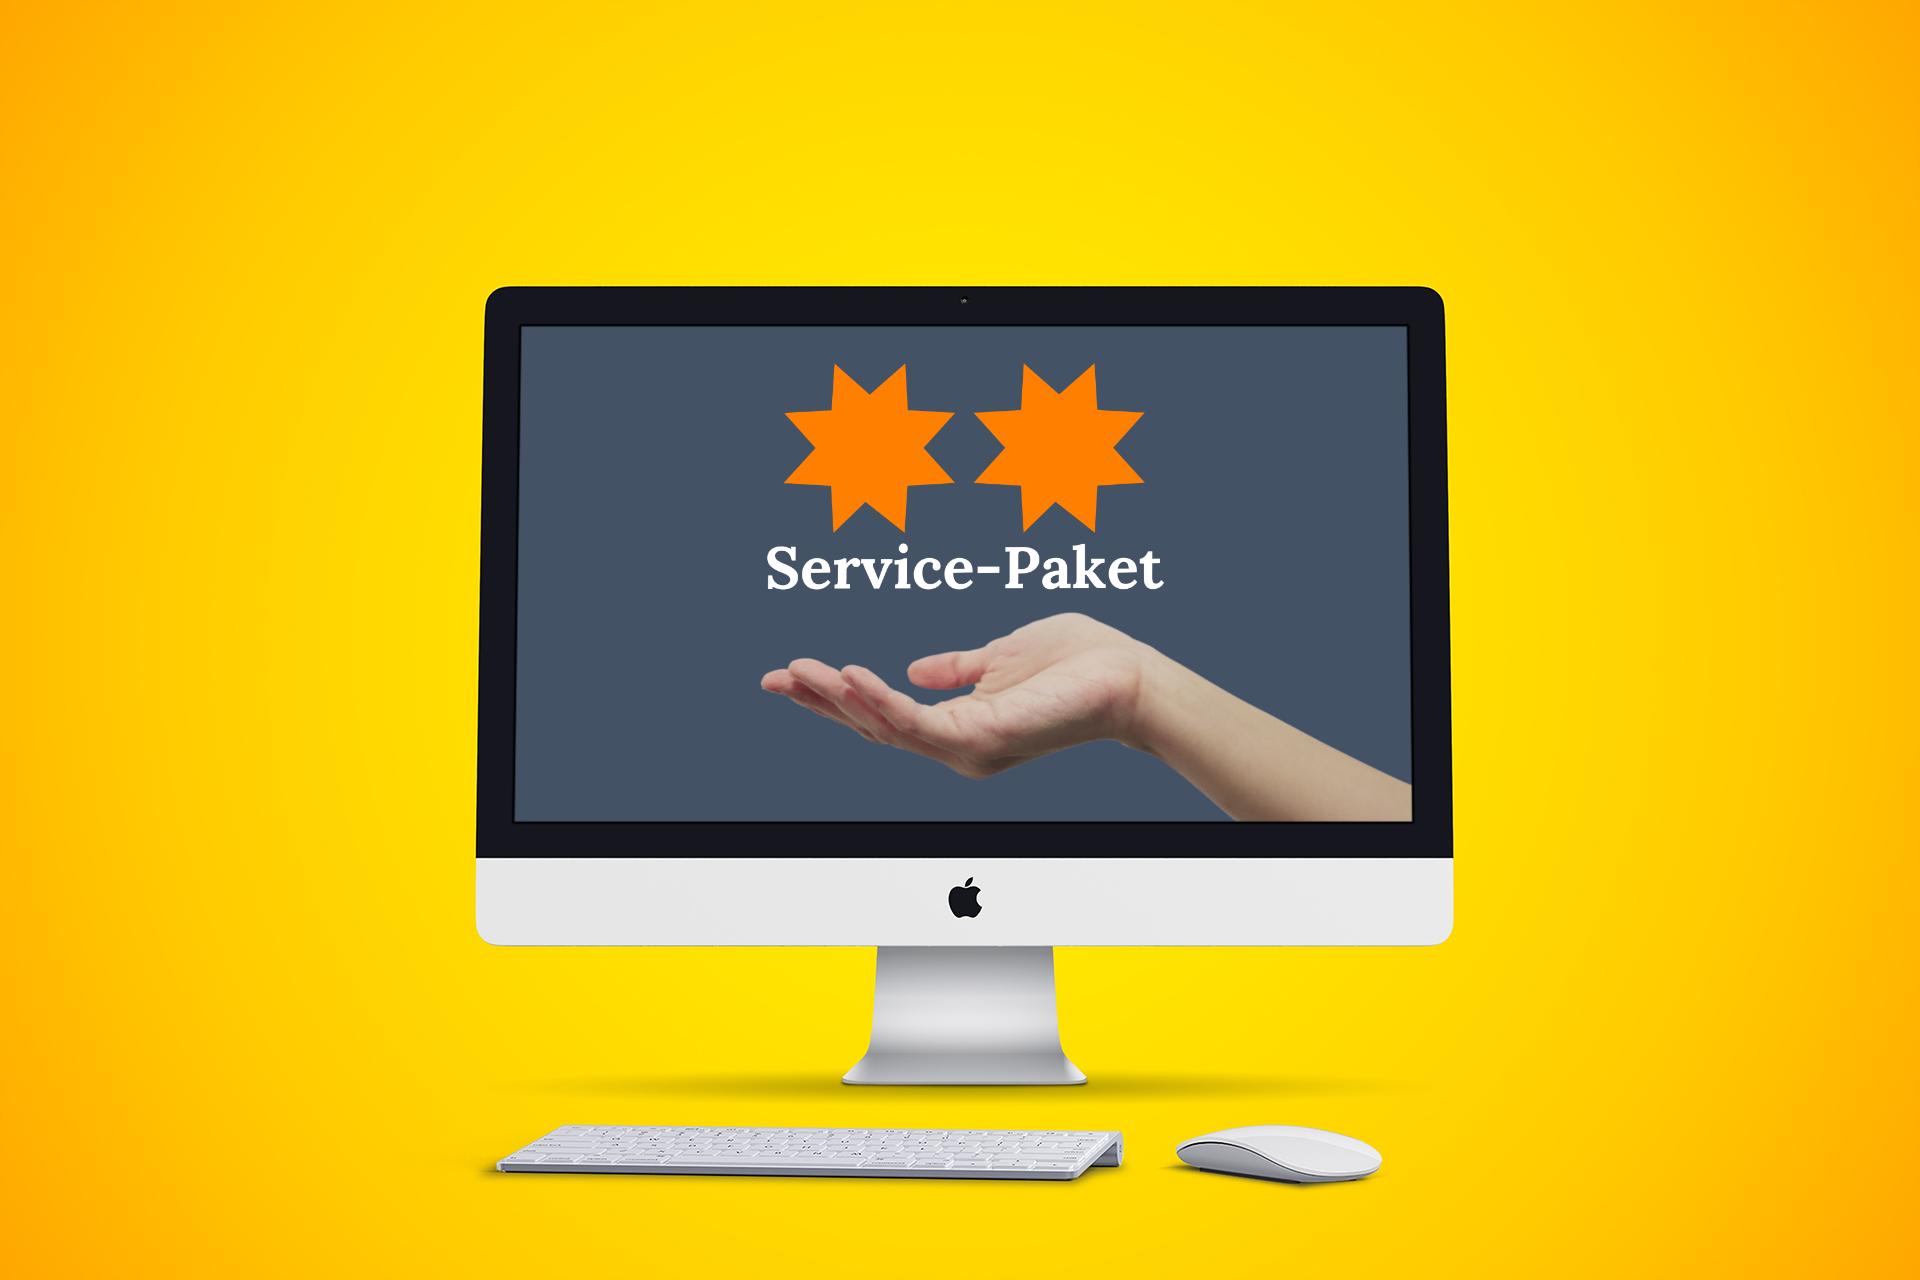 Minihotspot-Service-Paket für 12 Monate